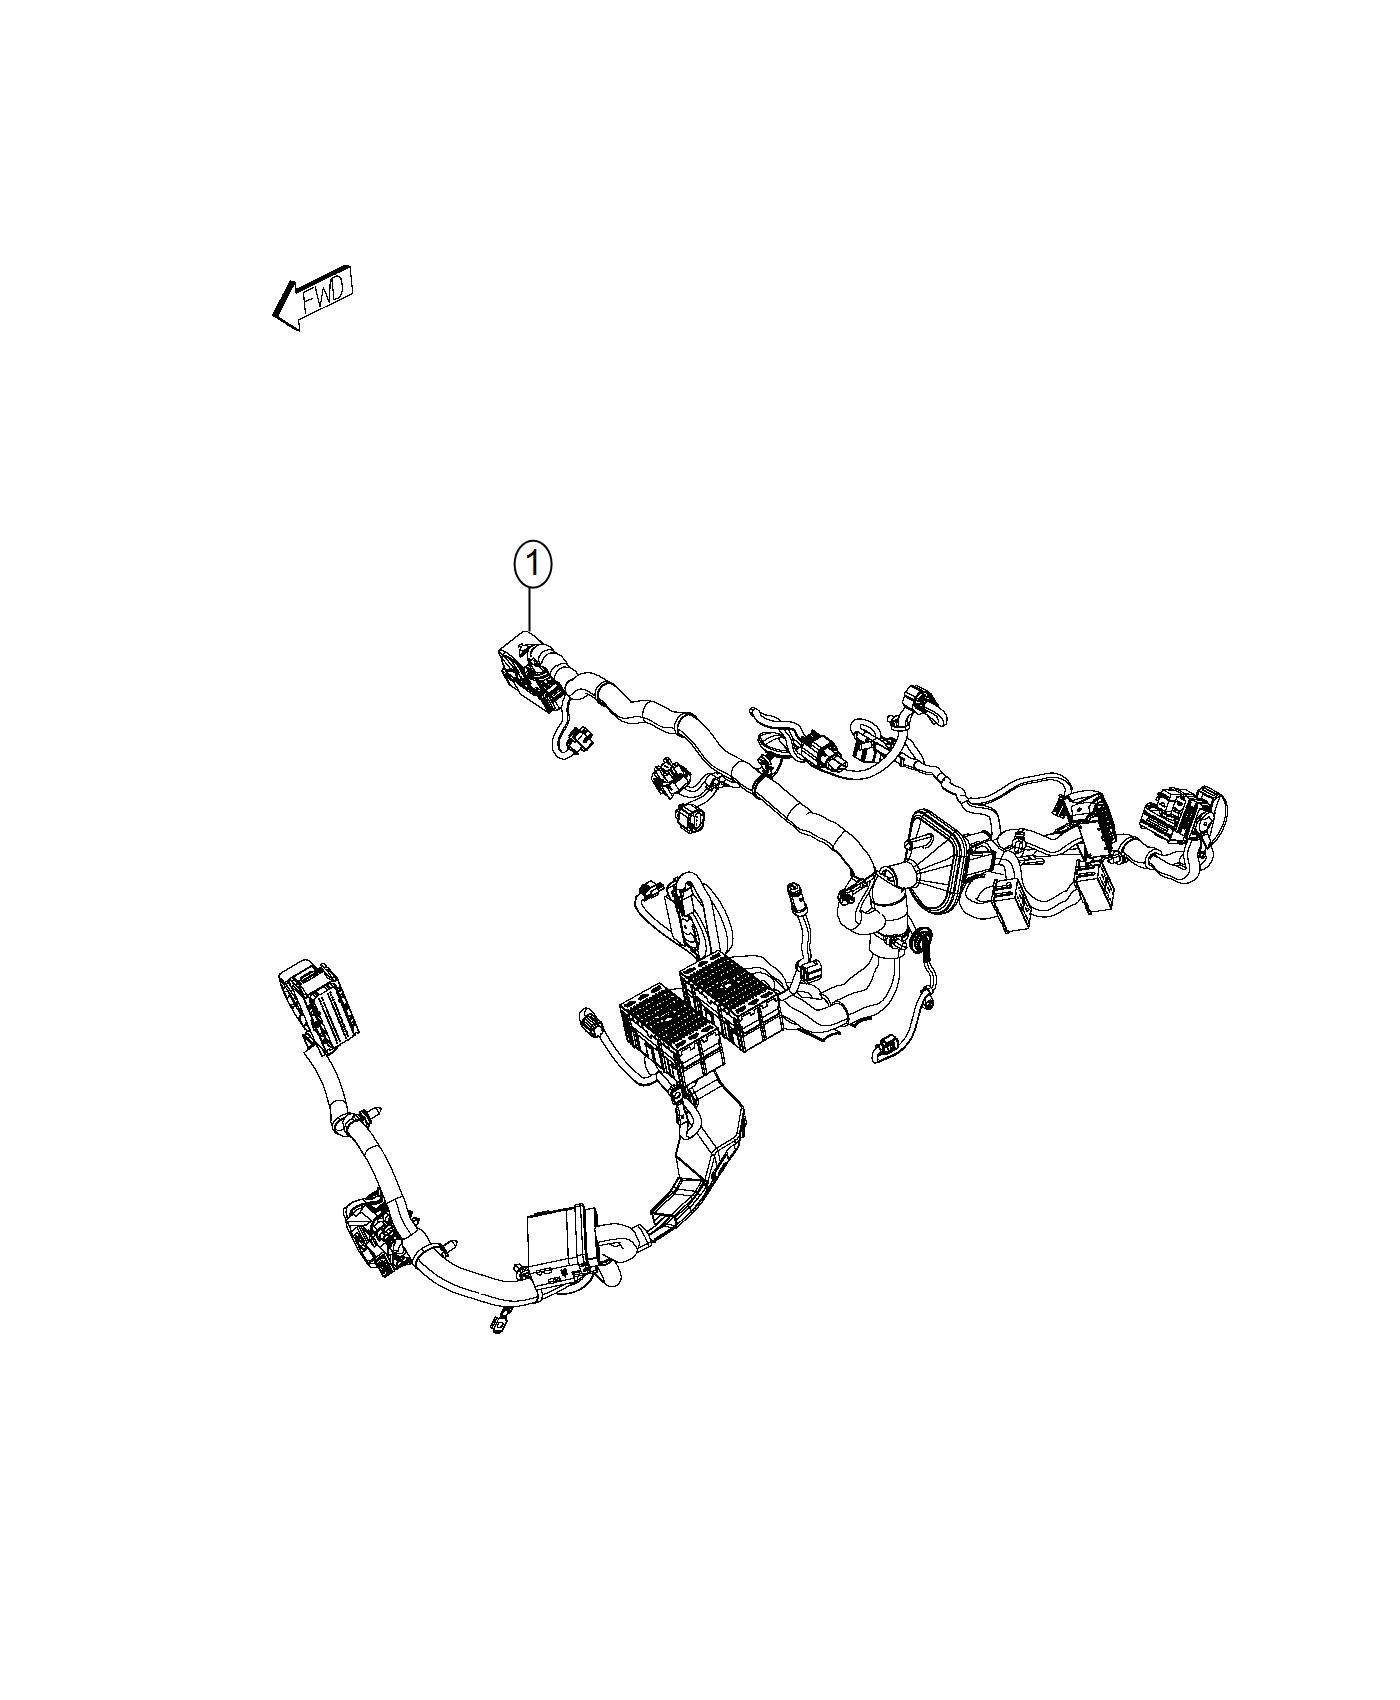 tags: #dump trailer wiring schematic#1953 ford tractor wiring diagram#painless  wiring mopar#dump trailer pump wiring diagram#willys wiring harness#dump